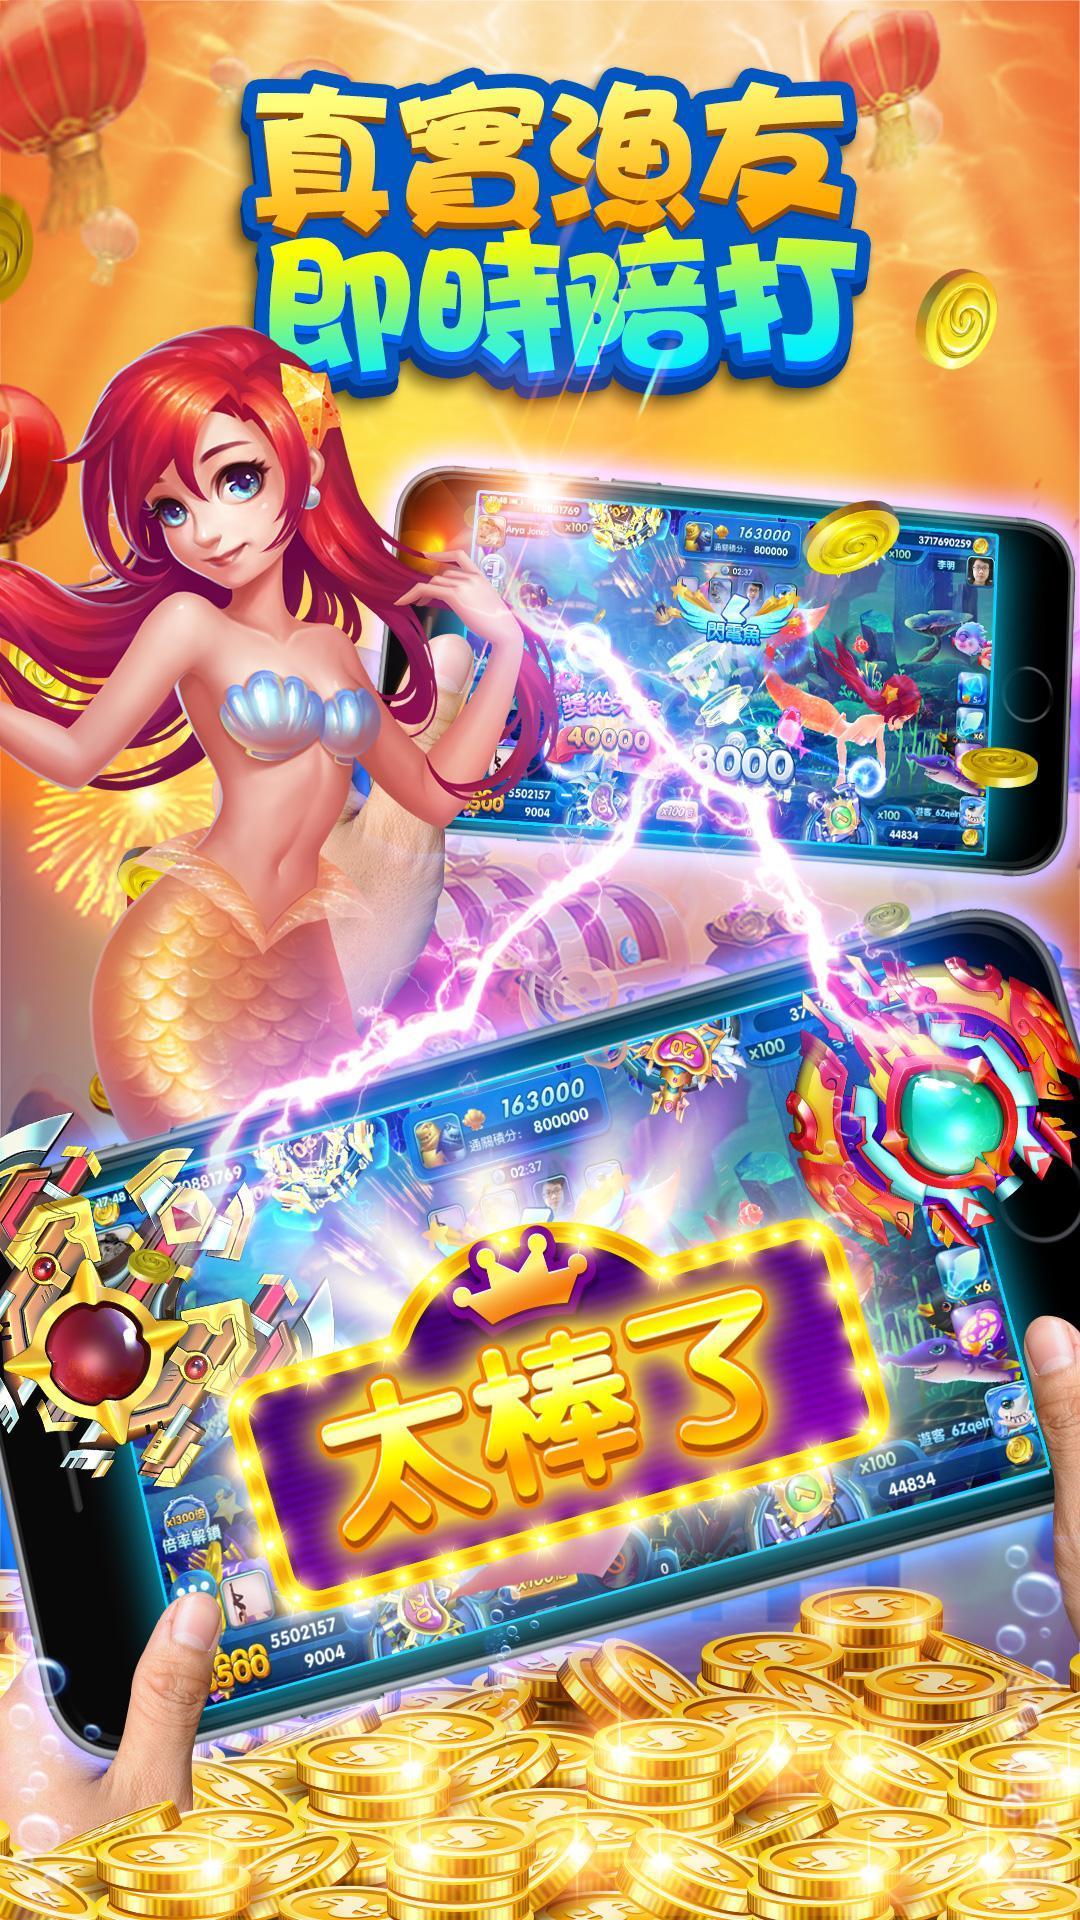 Fish is Coming: Best 3D Arcade 1.16.2 Screenshot 7